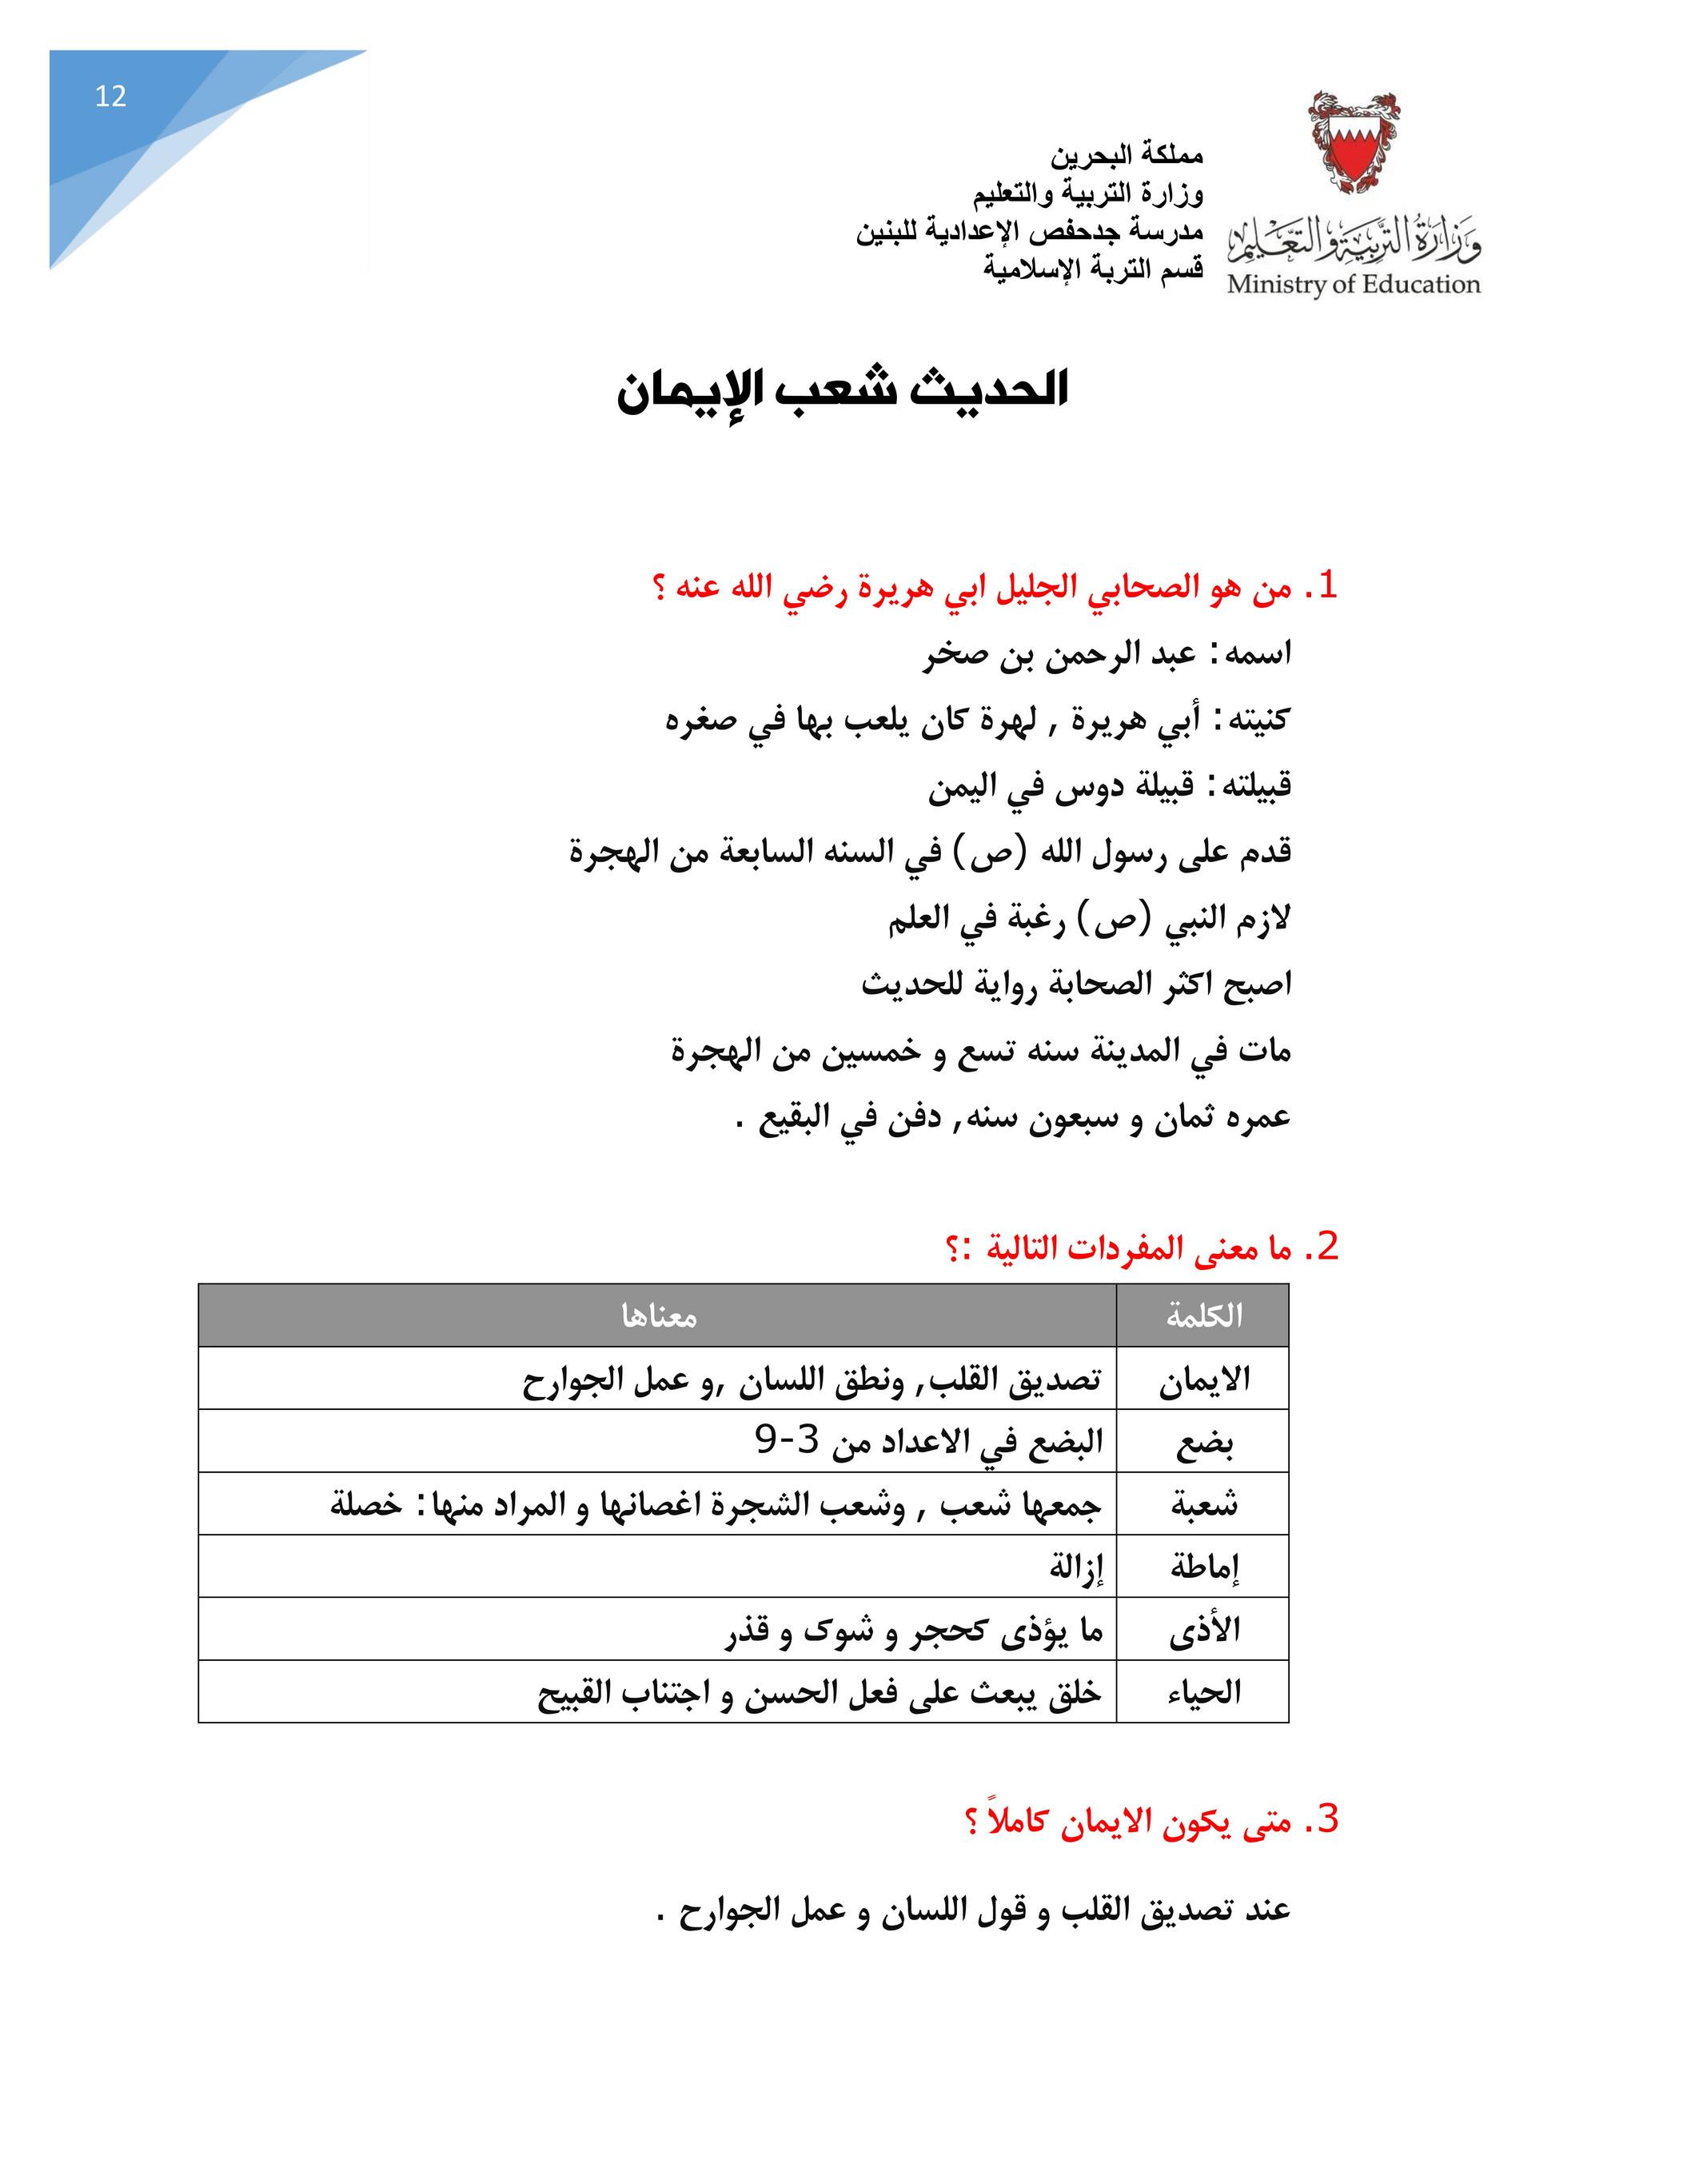 Moe مذكرة دروس ما قبل المنتصف لمادة التربية الإسلامية Page 15 Created With Publitas Com